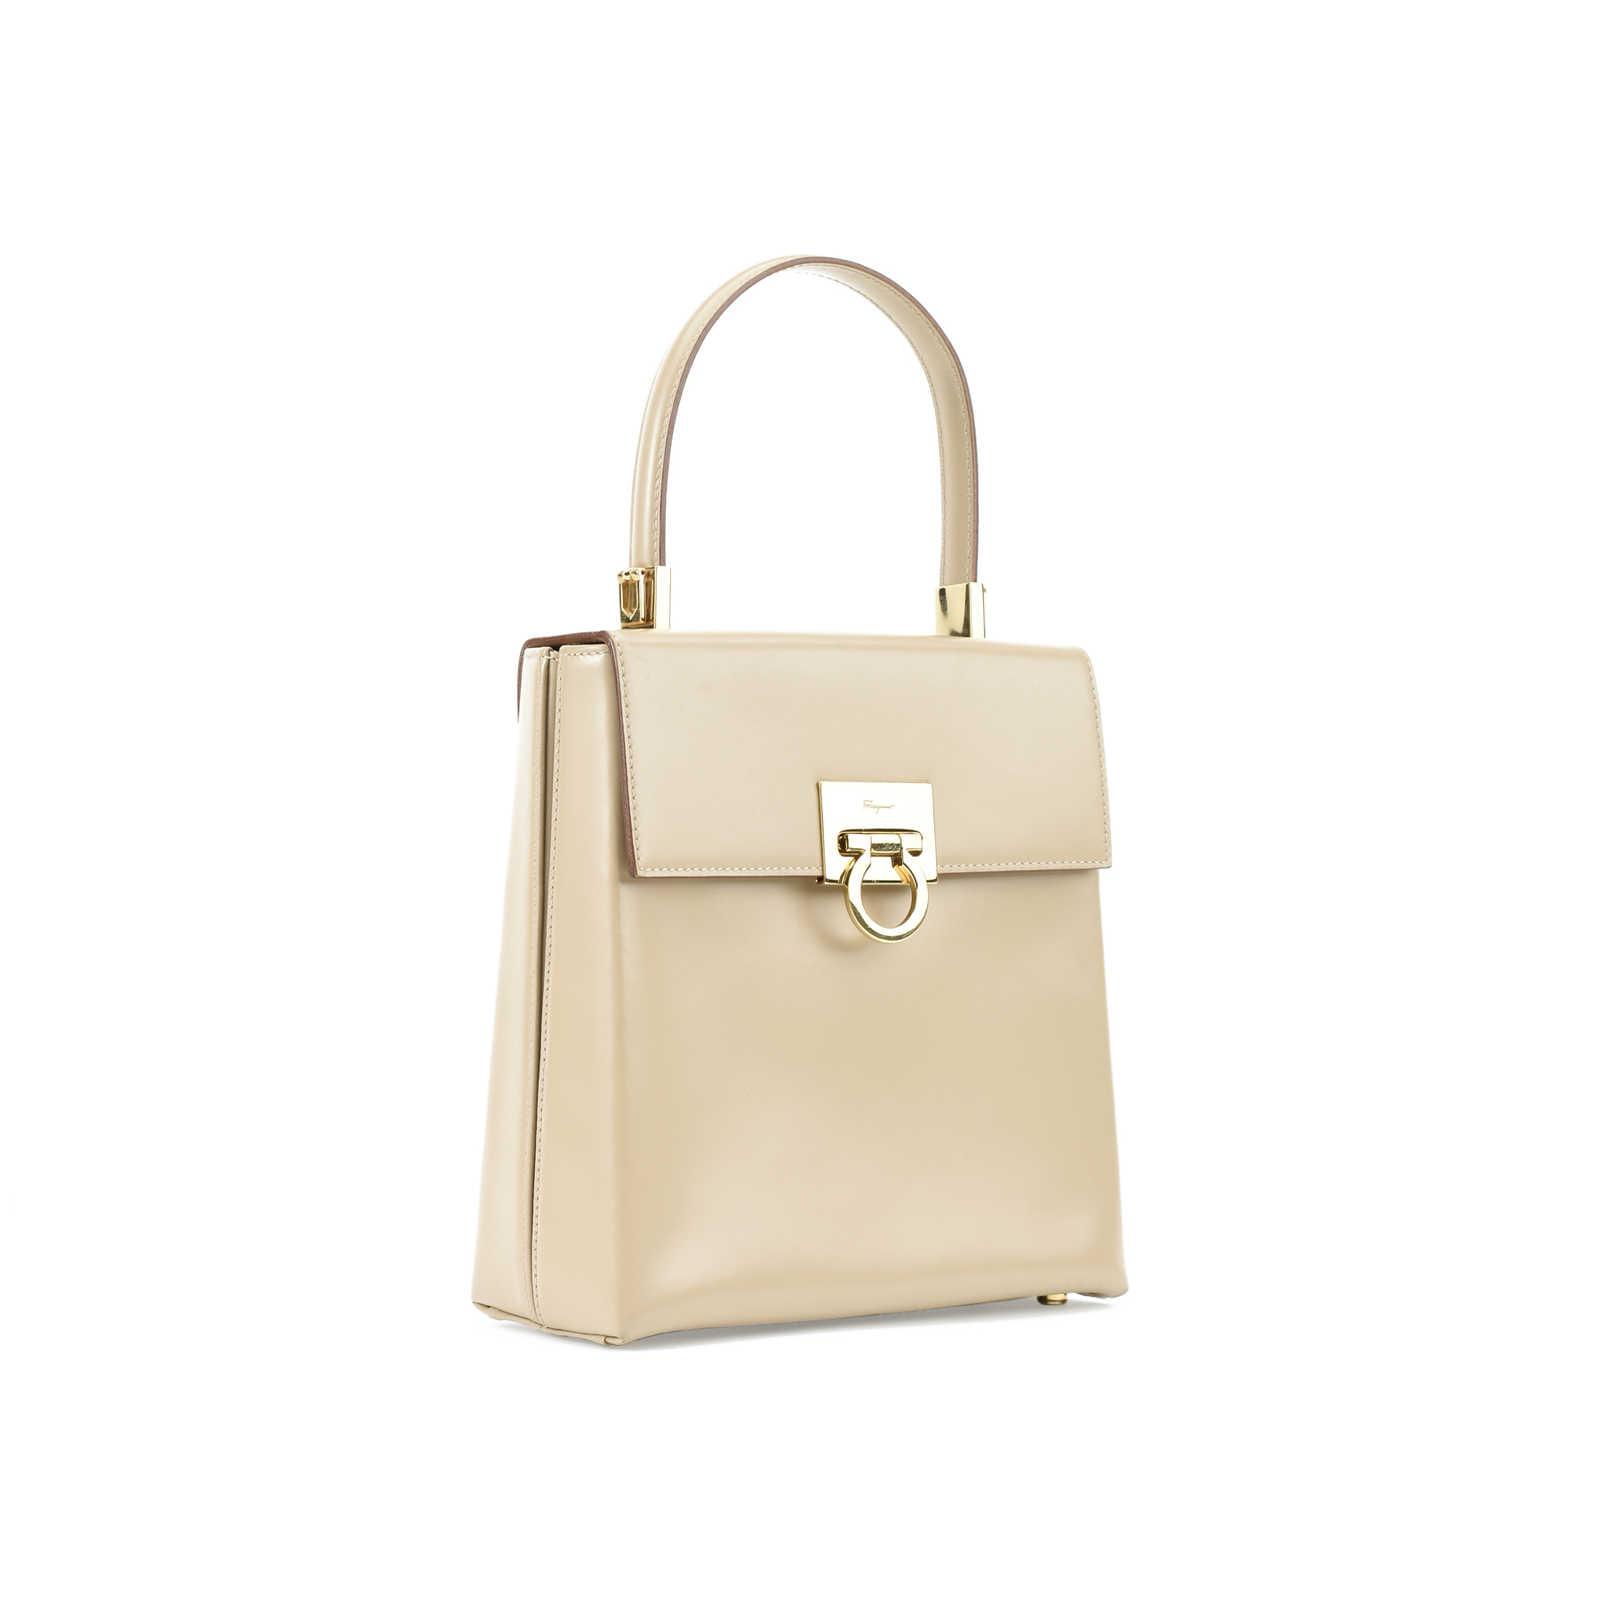 ... Authentic Vintage Salvatore Ferragamo Lady Gancini Kelly Bag  (PSS-377-00051) ... b1e74e1b6f32d